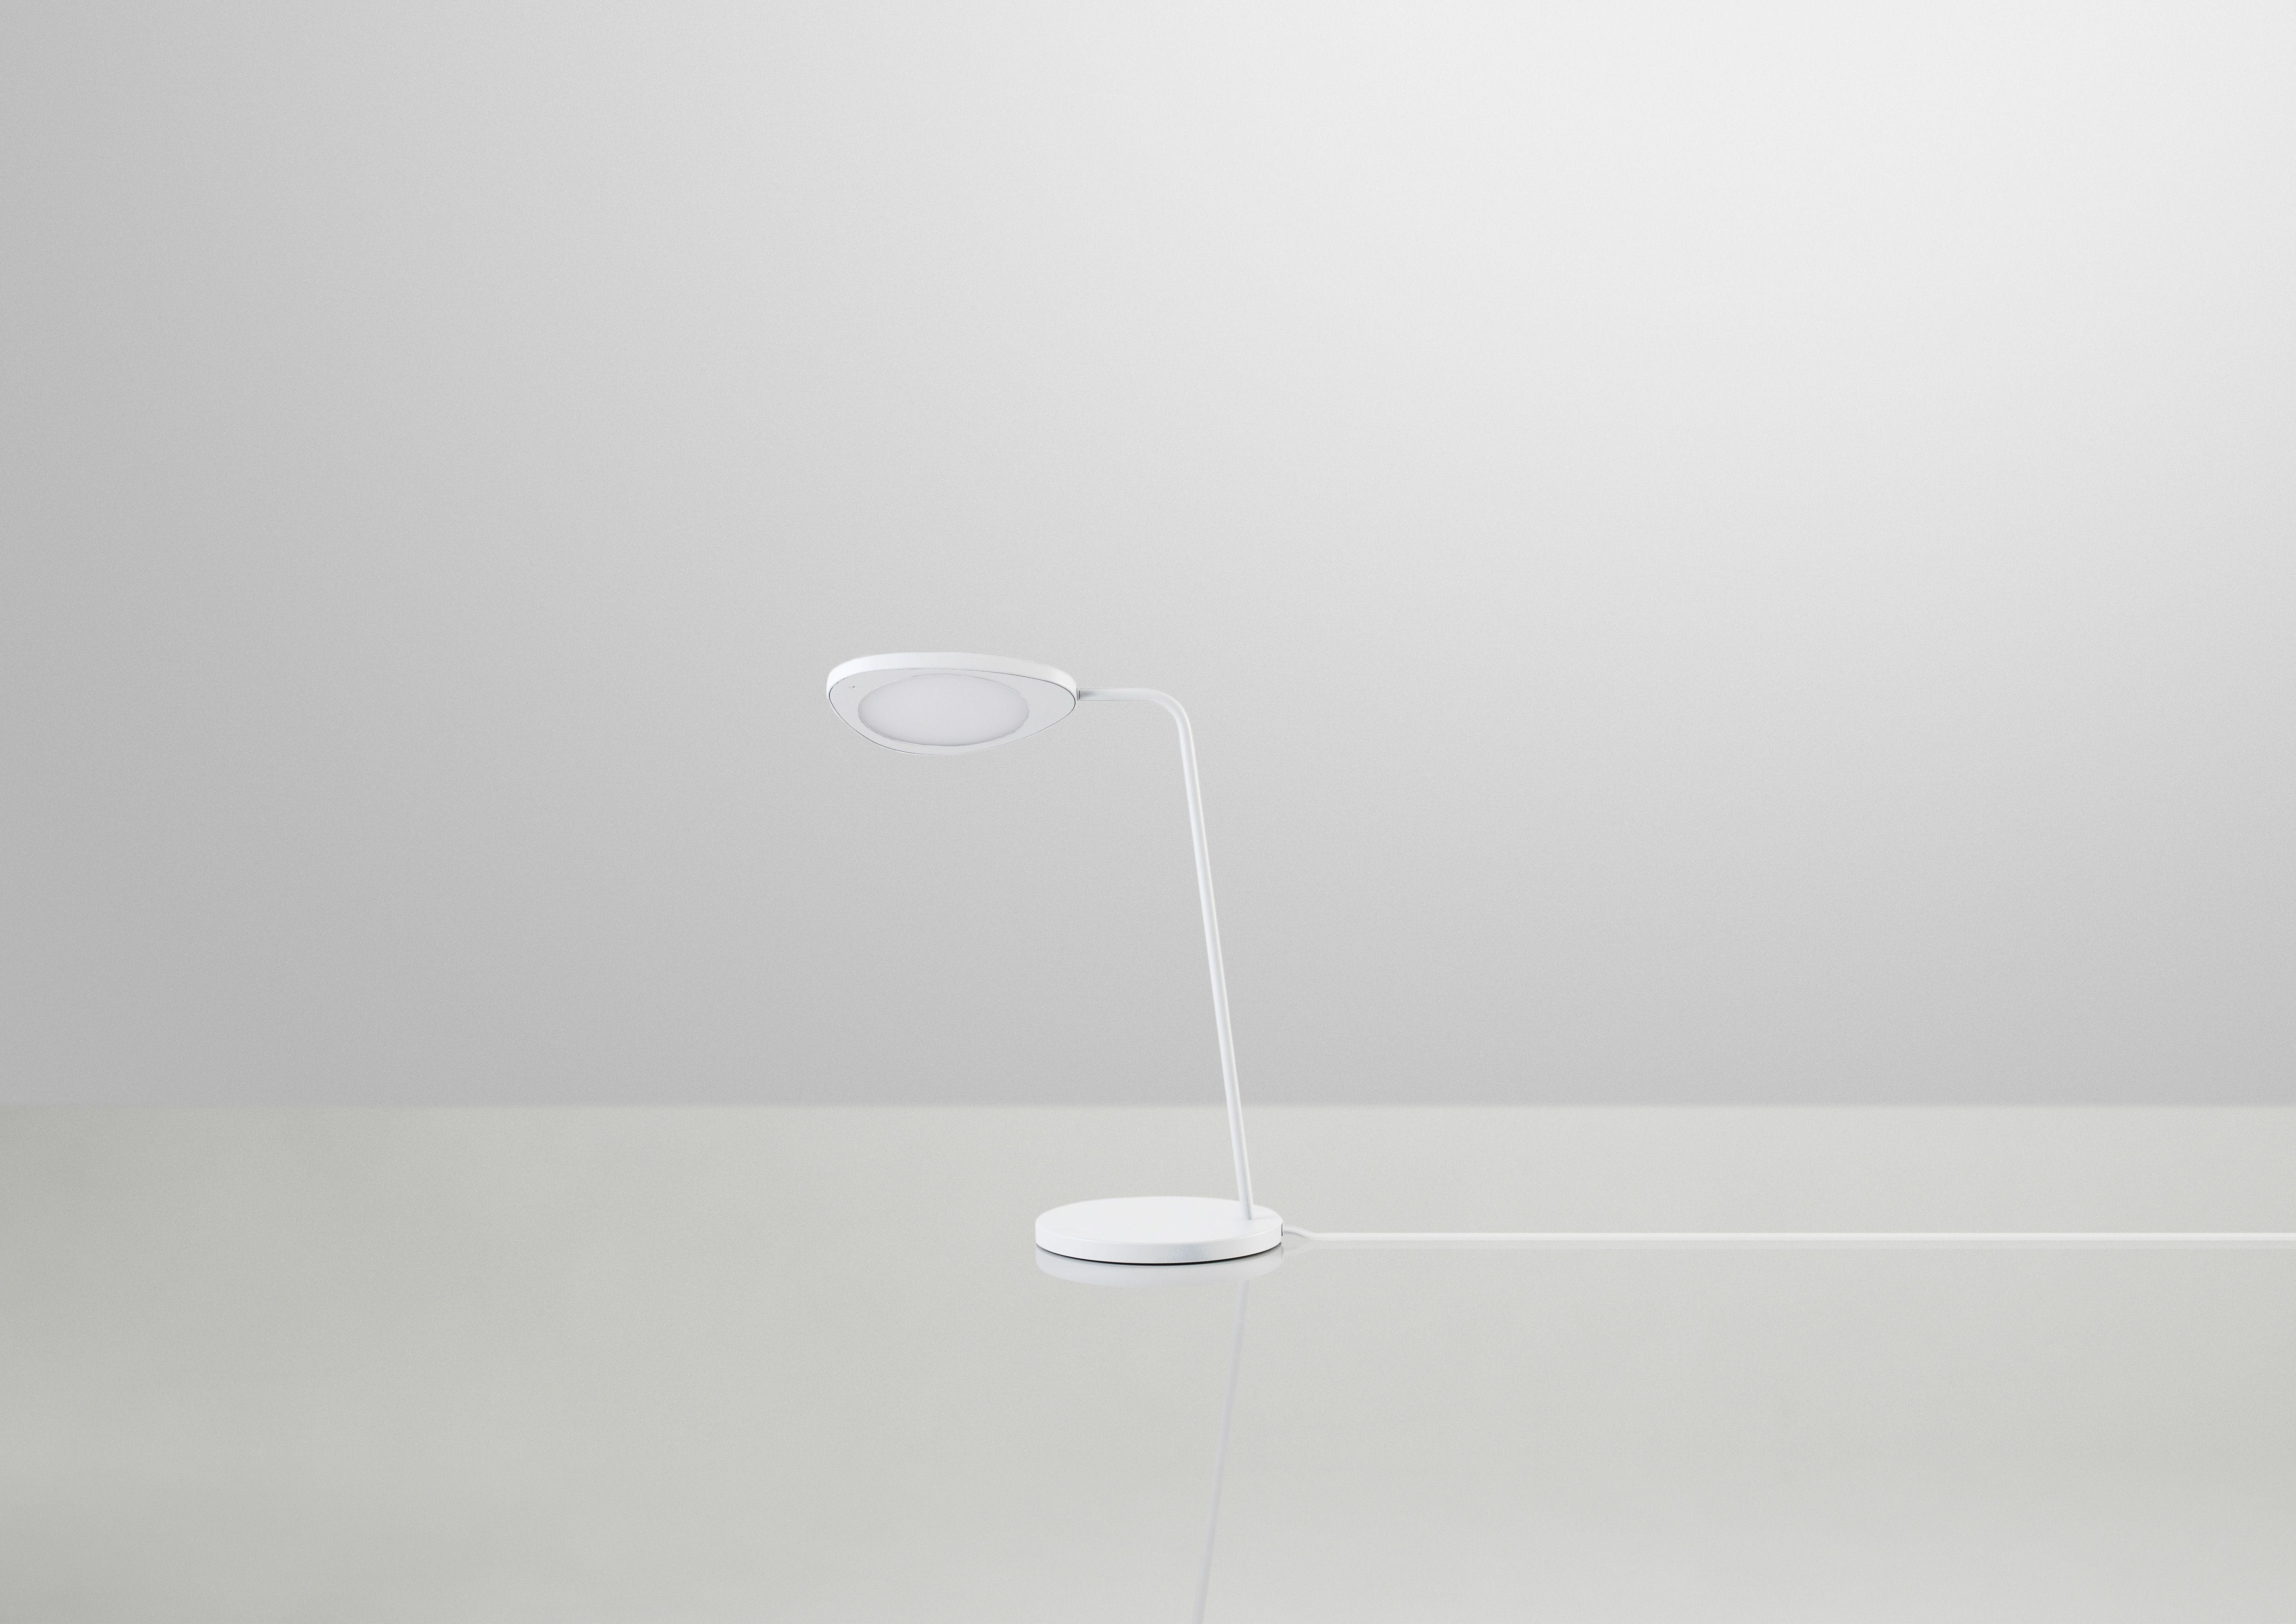 Leaf table lamp / Broberg & Ridderstråle / Muuto